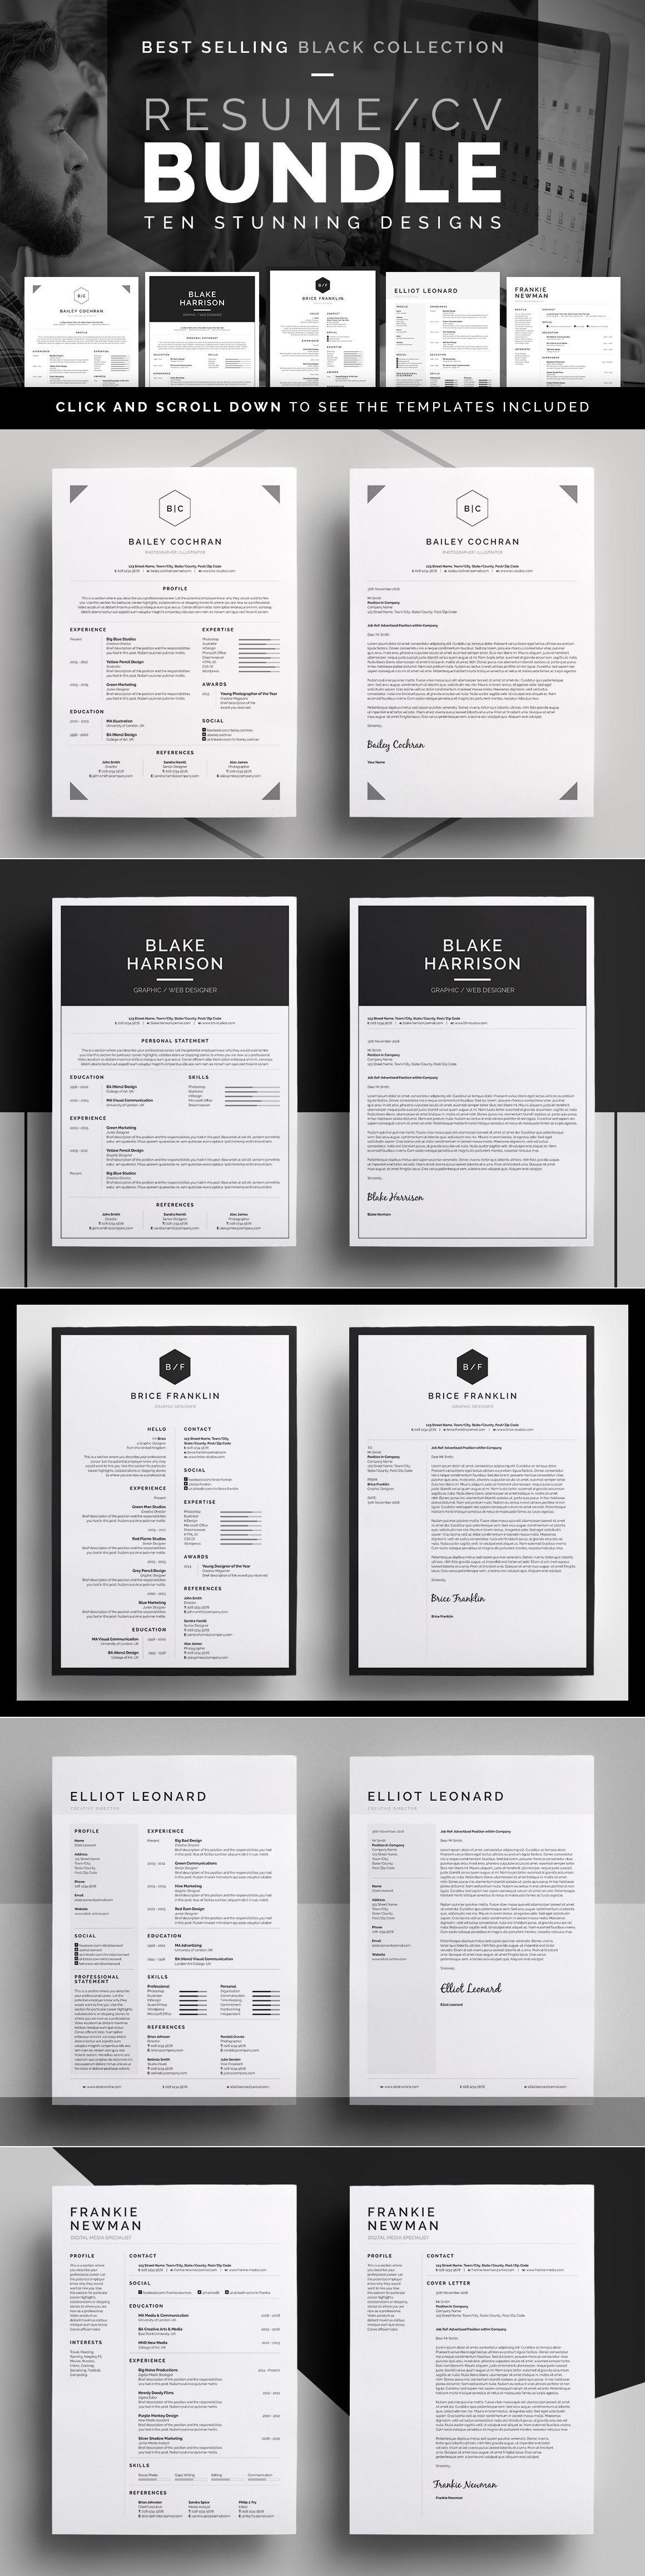 Resume/CV Bundle - 10 Modern, Professional designs with Matching ...